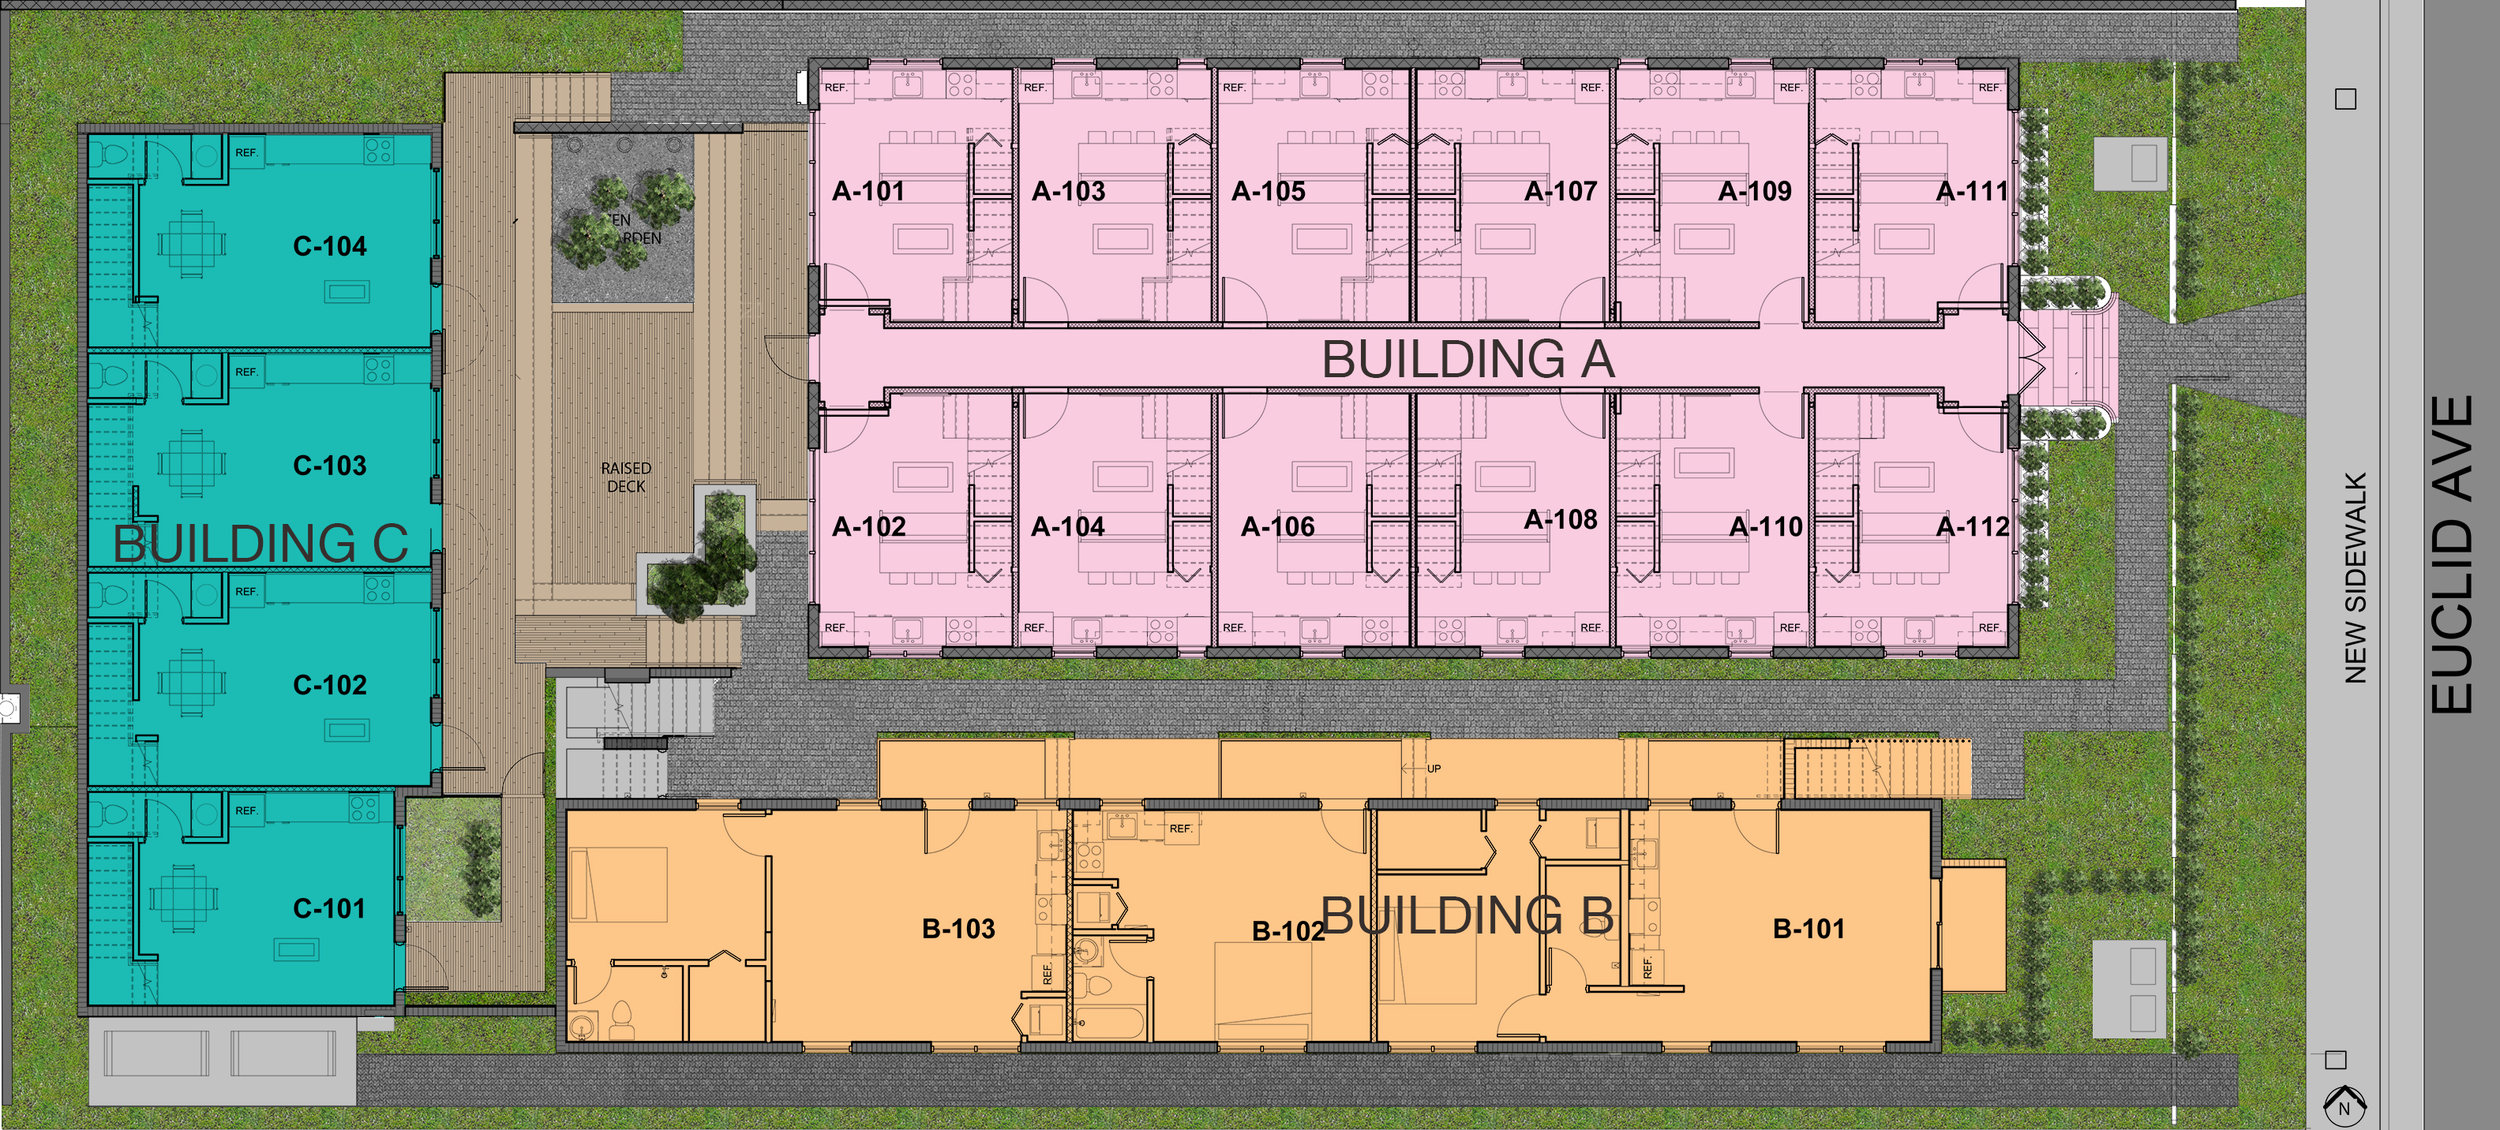 Canterbury's Site Plan